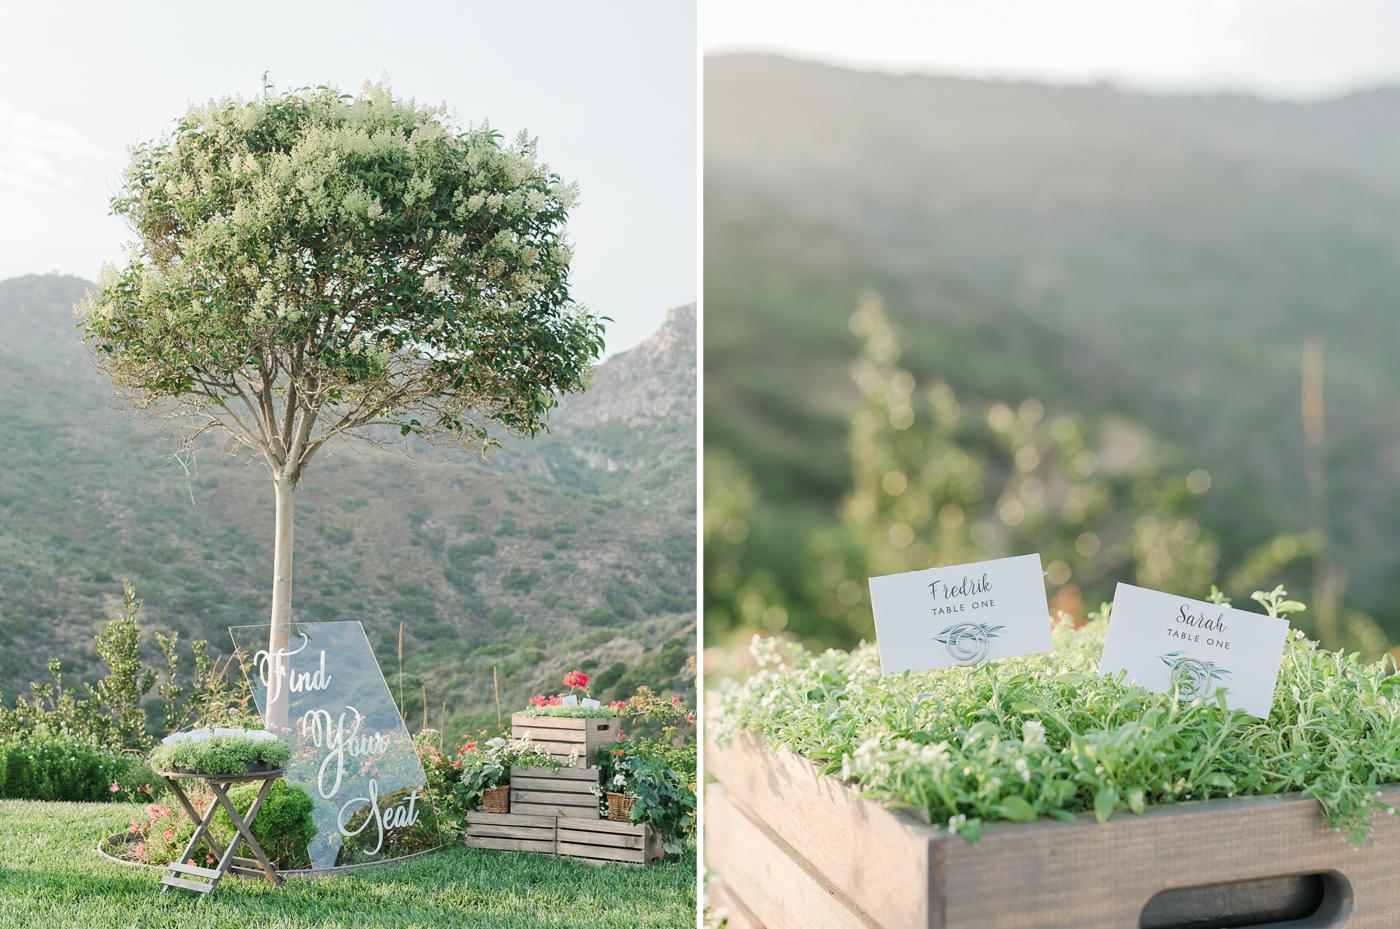 AKP_S&F_Malibu_Wedding_Fine_Art_Photography_Los_Angeles-52_reception_table_sign.jpg